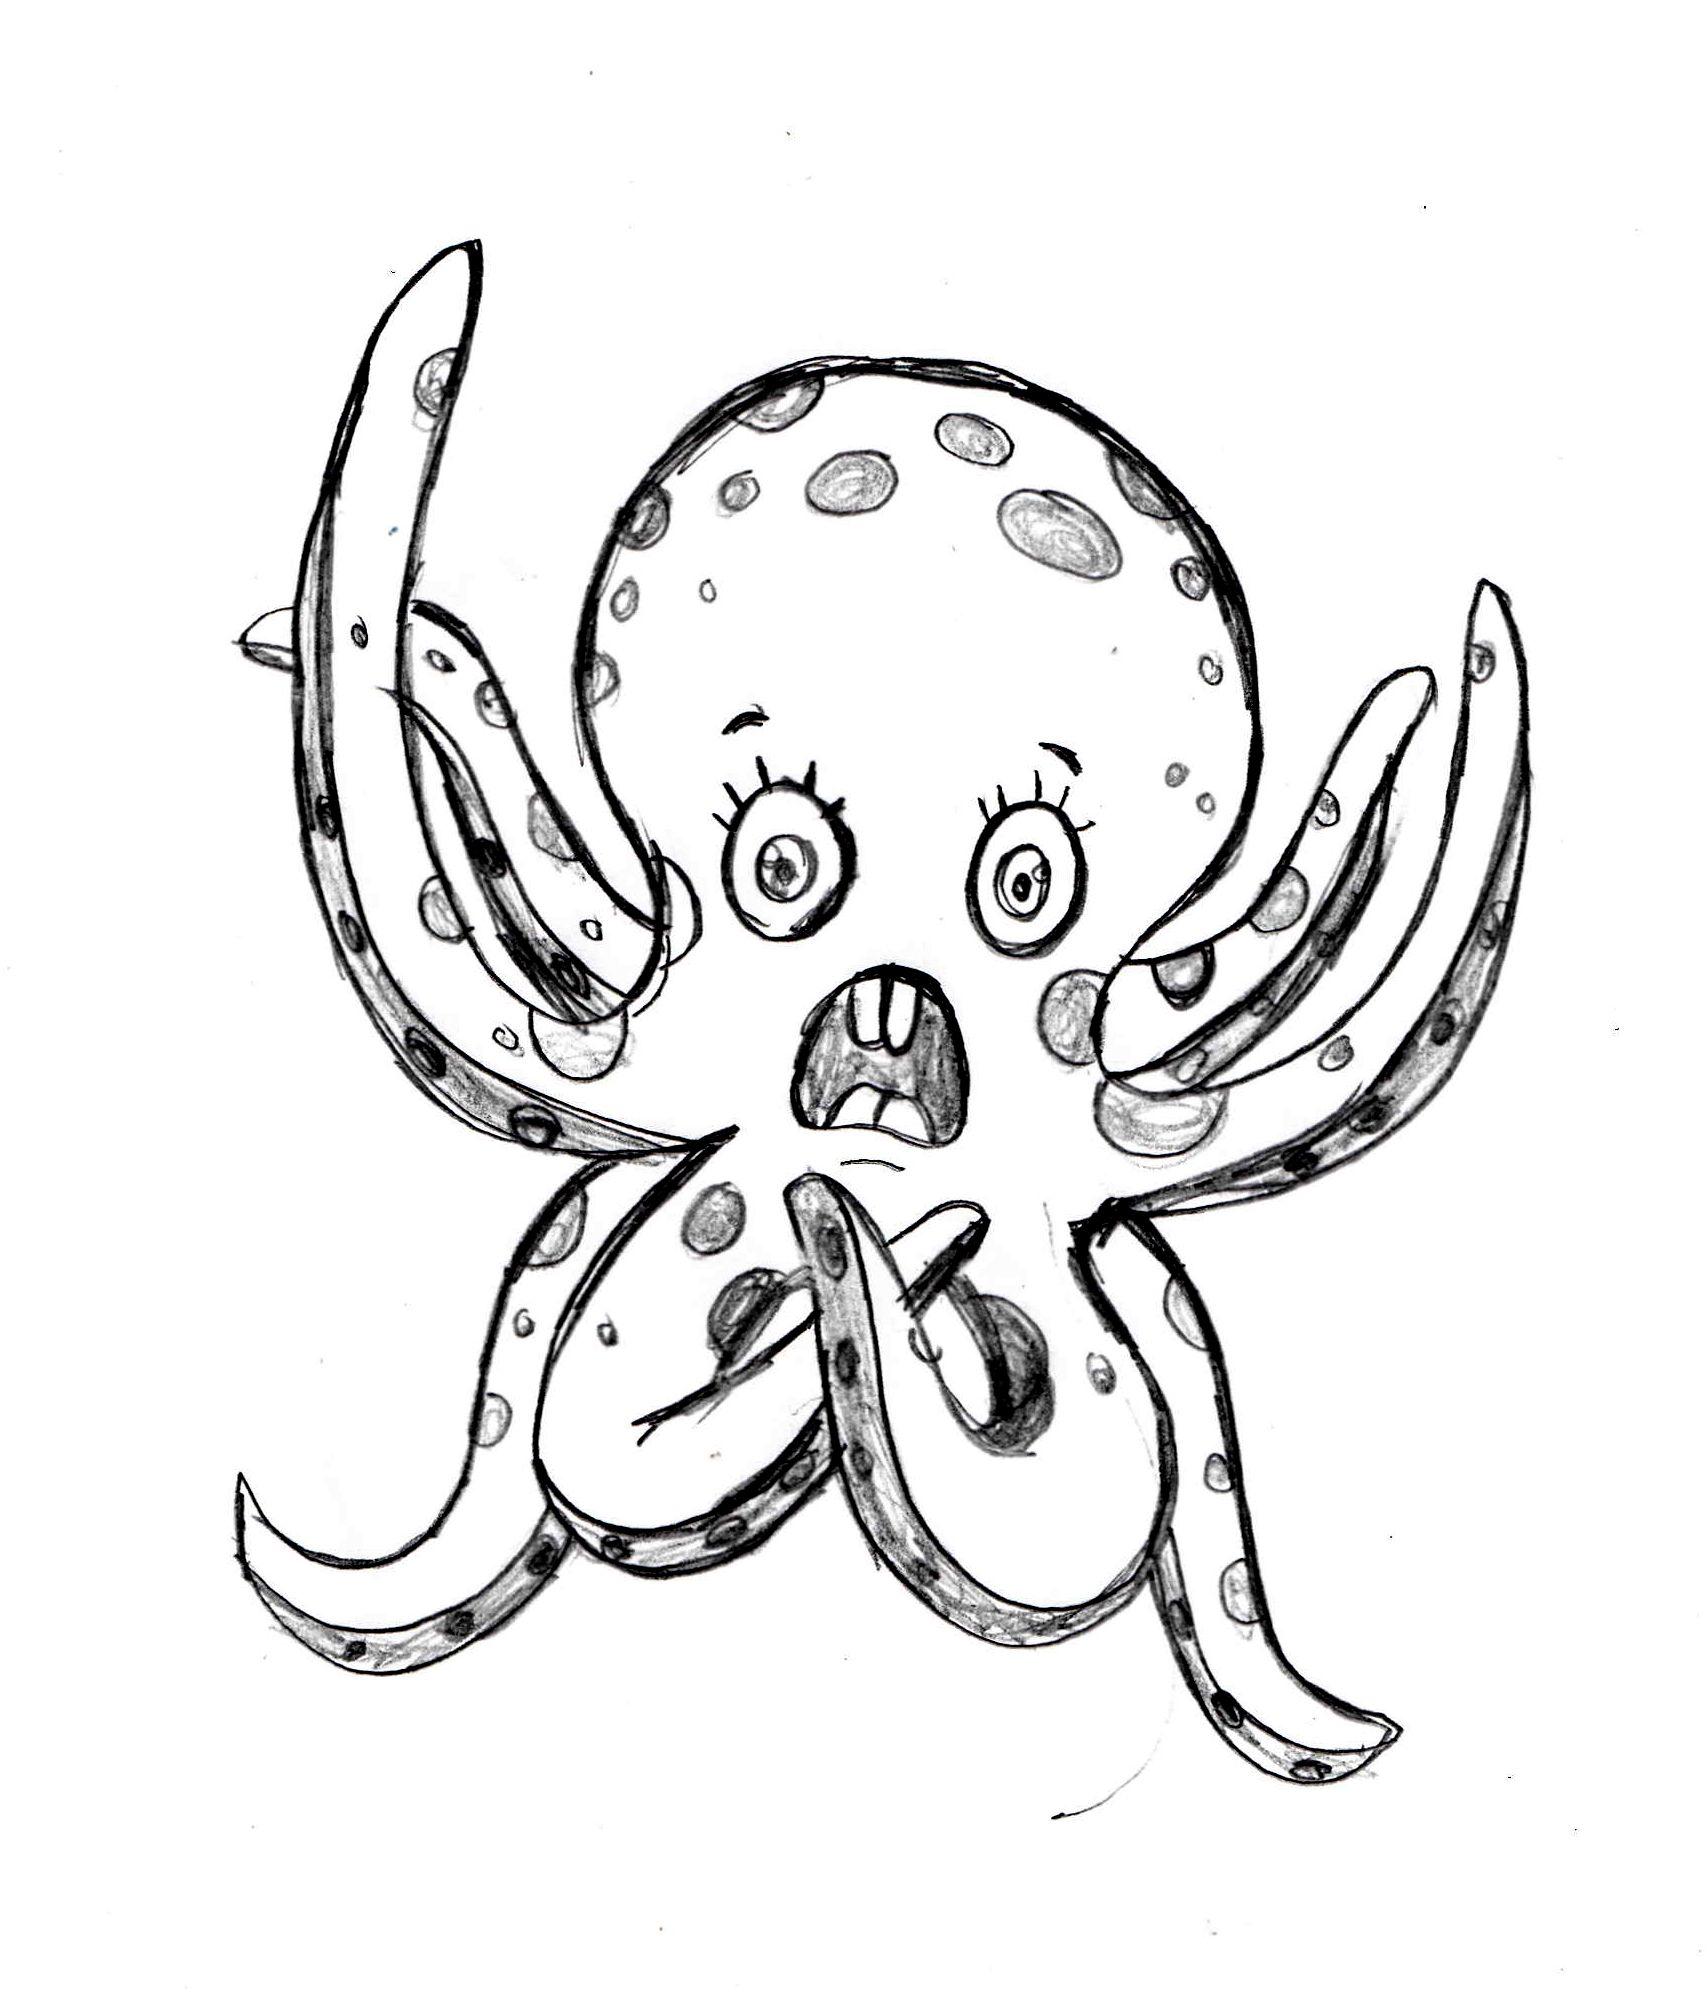 Octopus sketch, drawing tutorial http://drawingmanuals.com